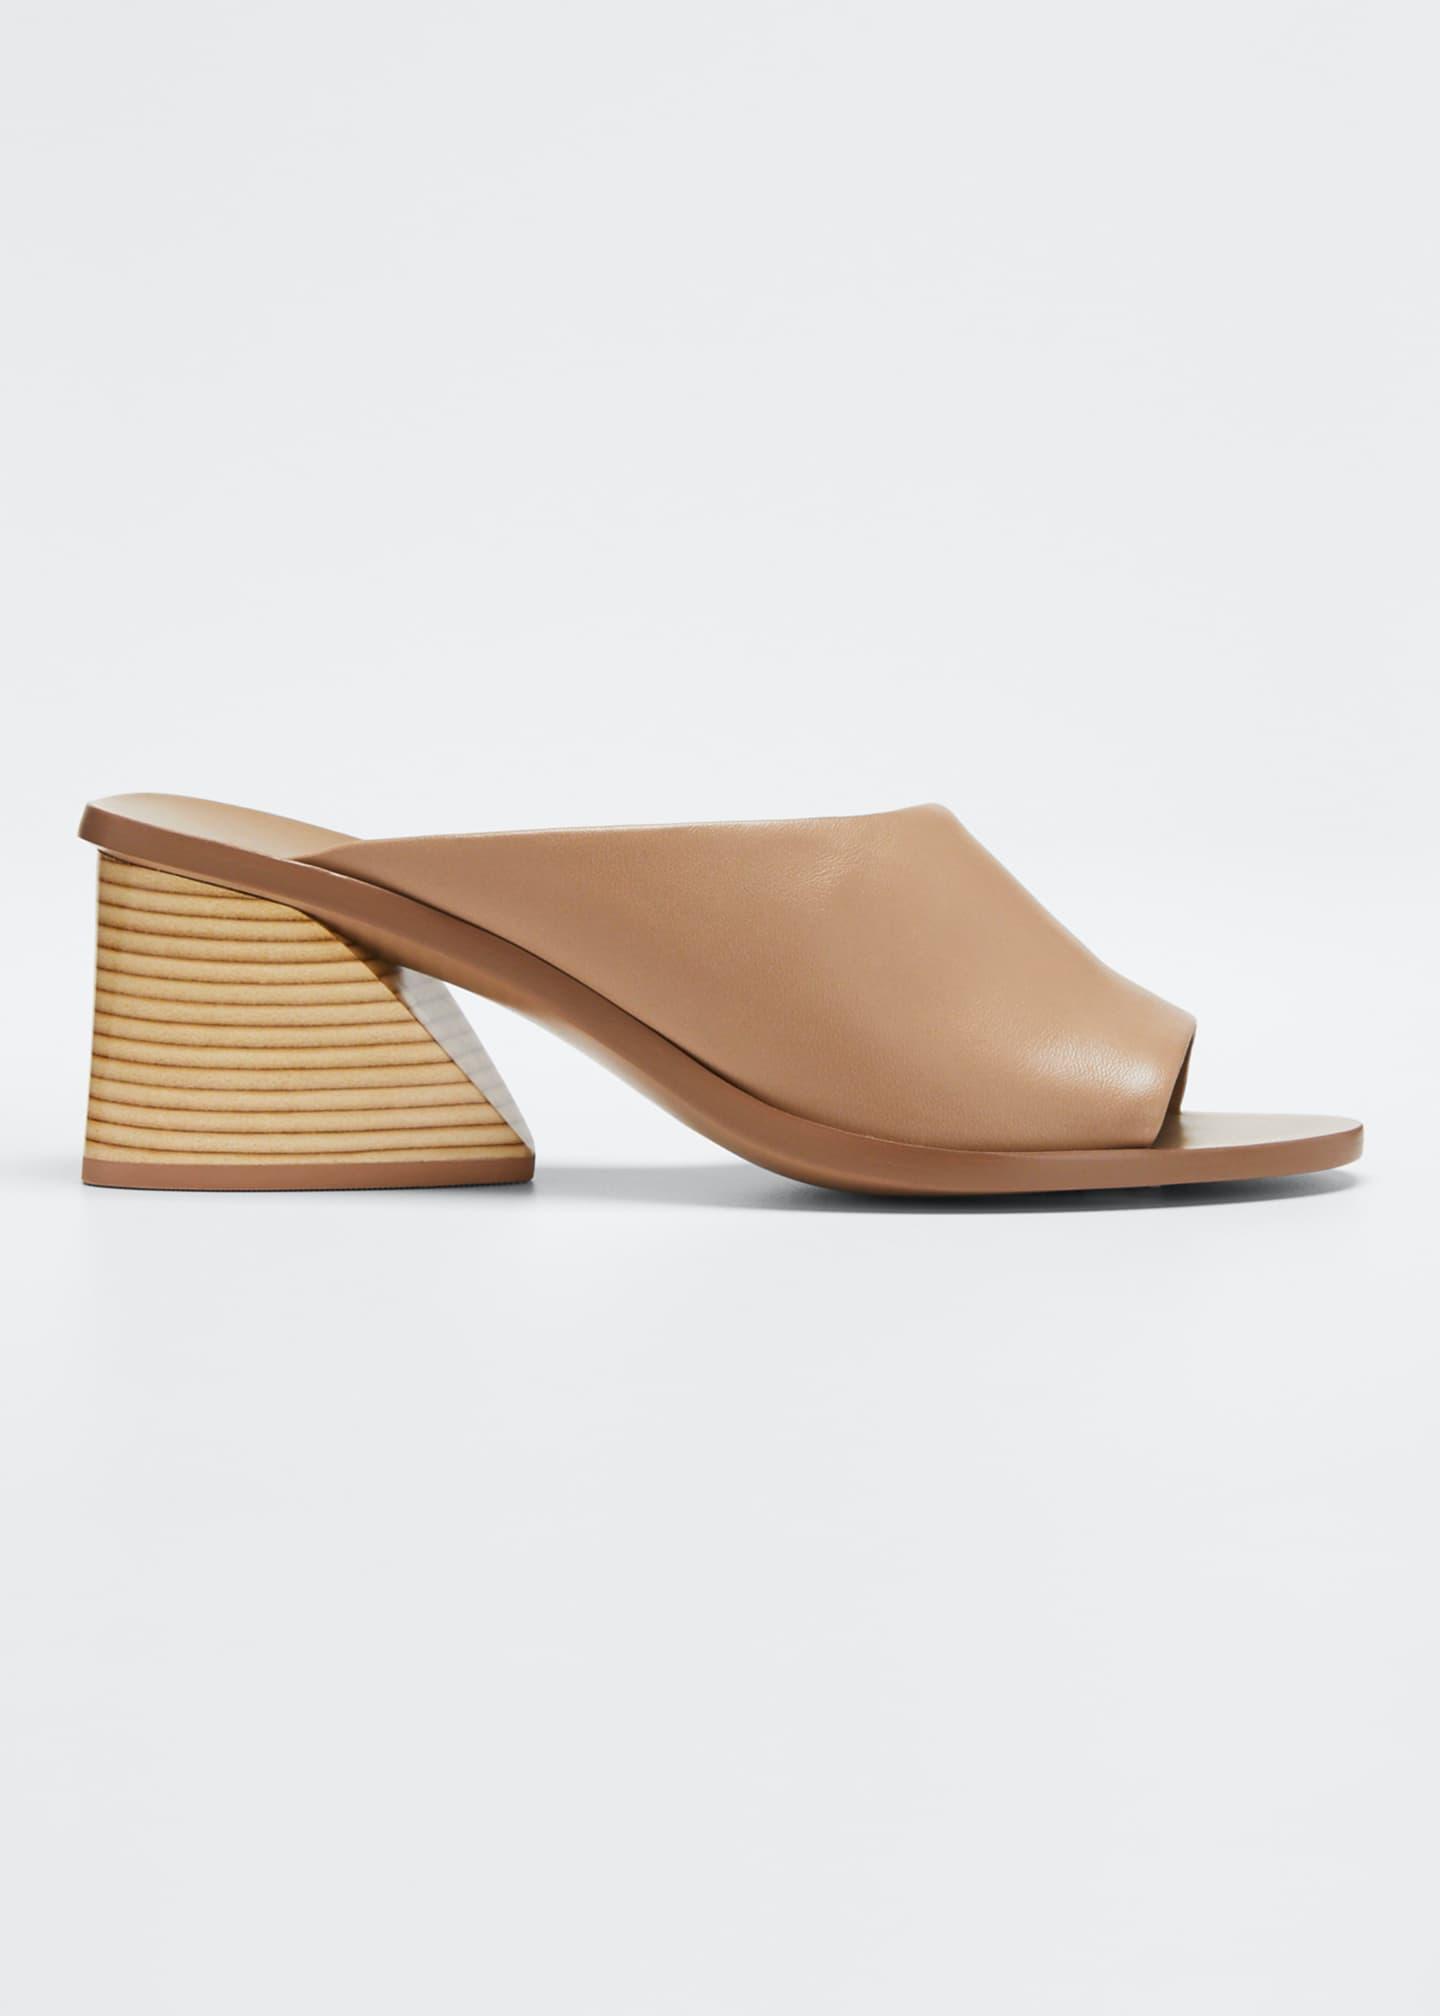 Mercedes Castillo Izar Suede Low-Heel Architectural Slide Sandals